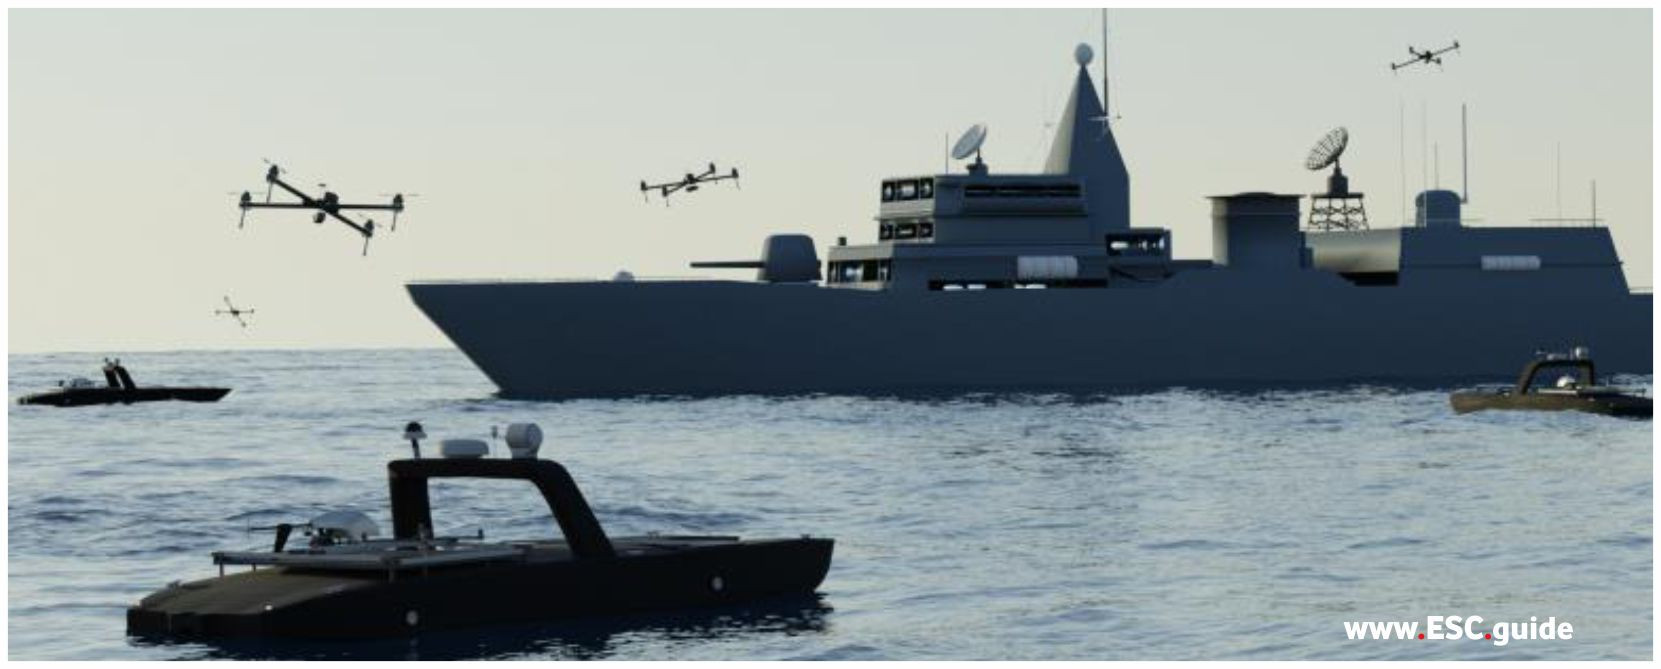 Swarm utilizes UAV and USVs to harass adversarial vessel.